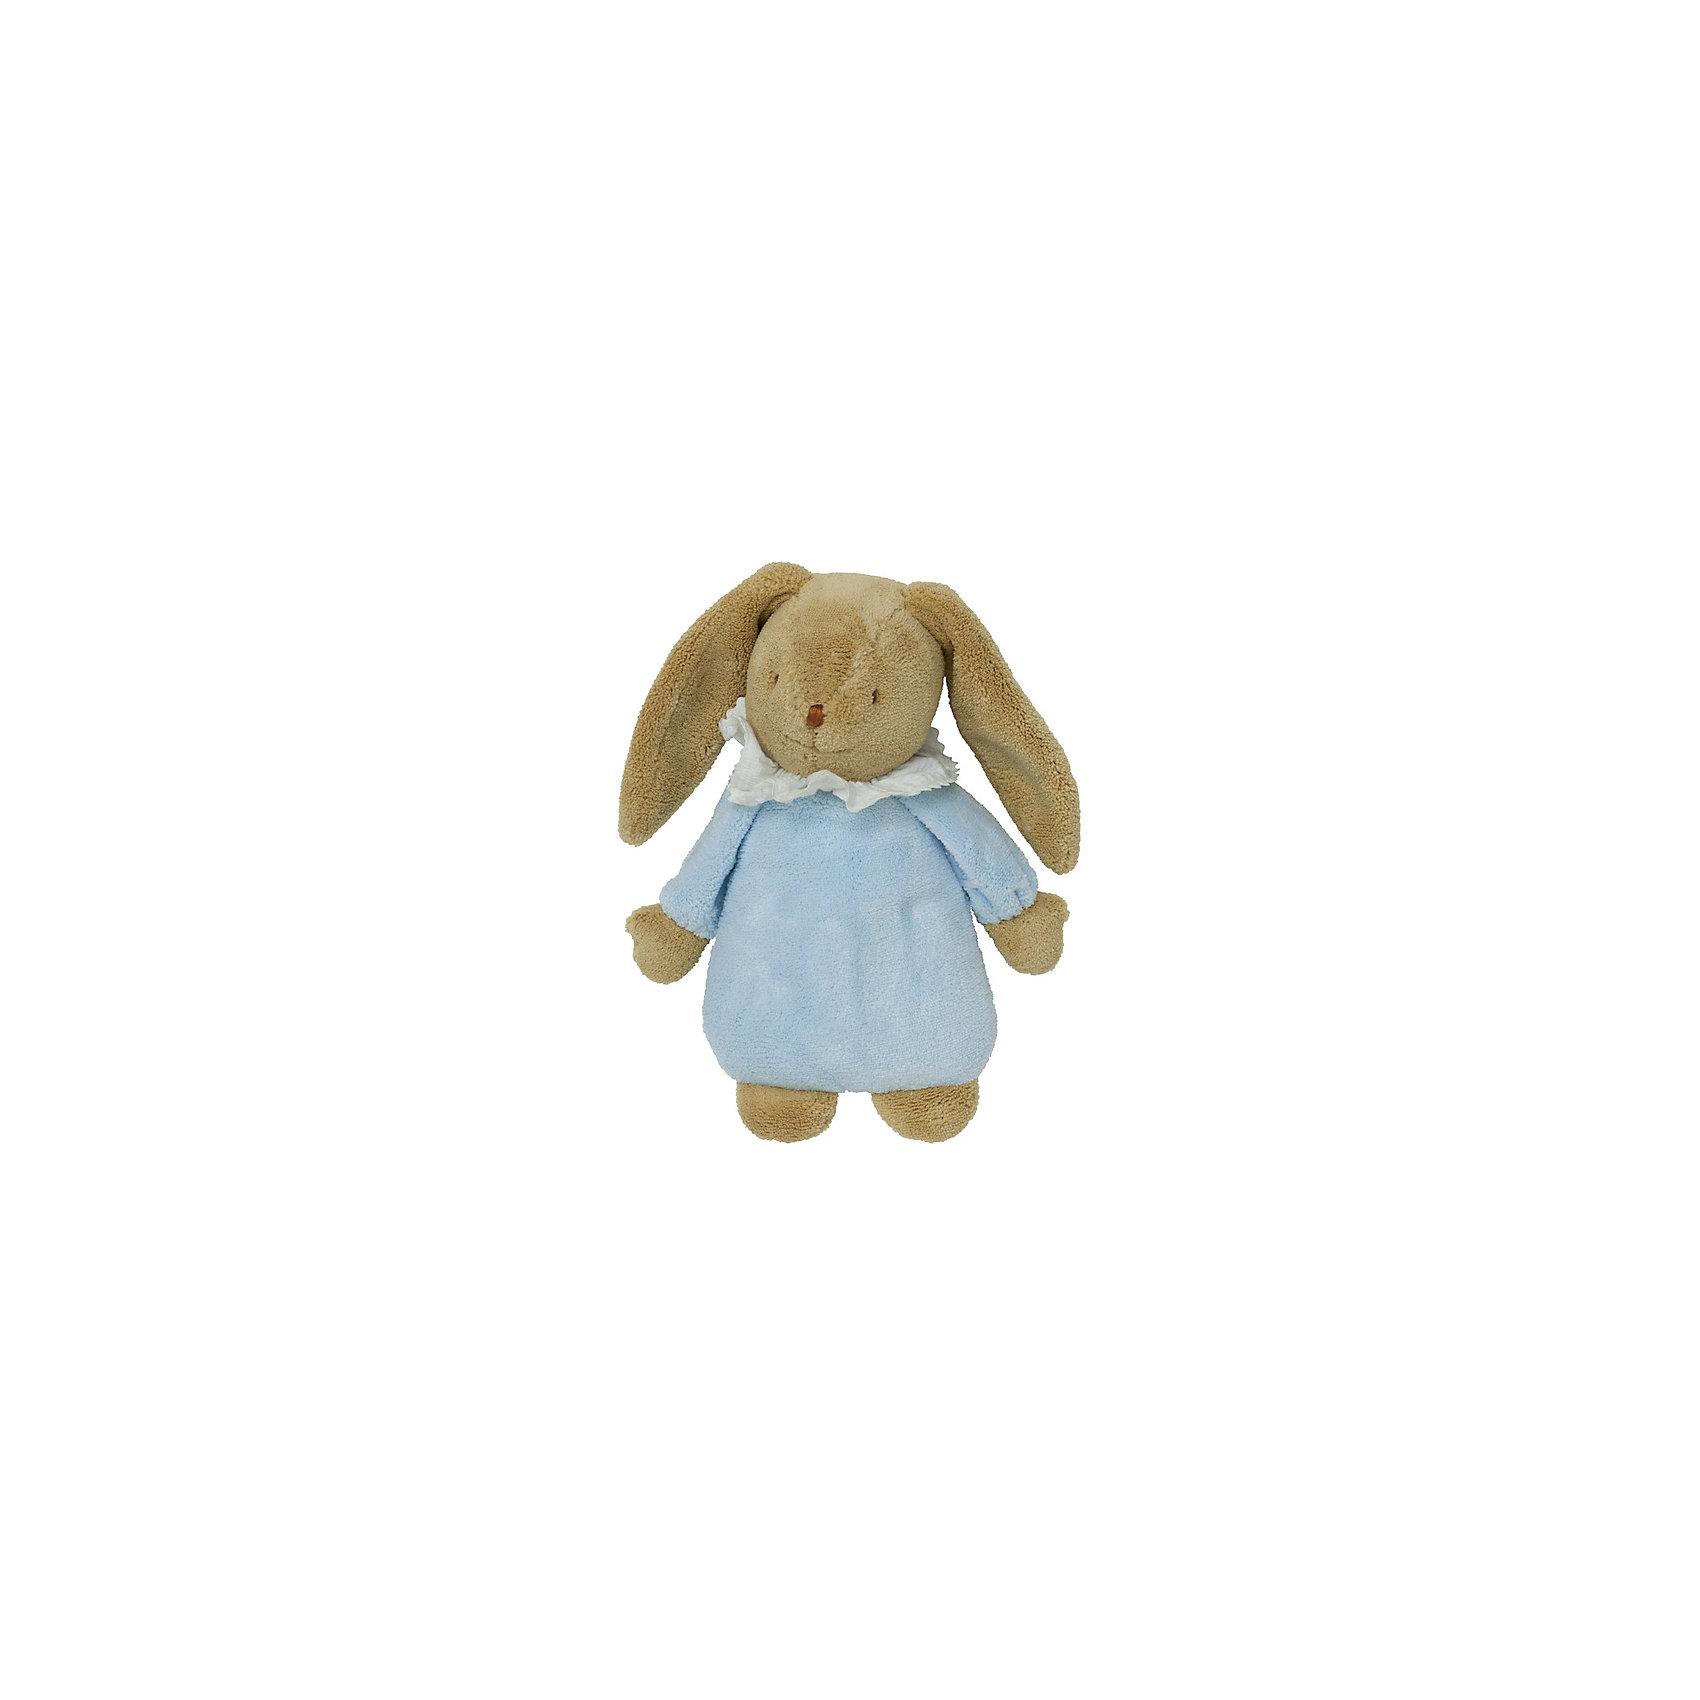 TROUSSELIER Мягкая игрушка Зайка с музыкой, голубой, 25см, Trousselier trousselier мягкая игрушка зайка с музыкой розовый 25см trousselier page 2